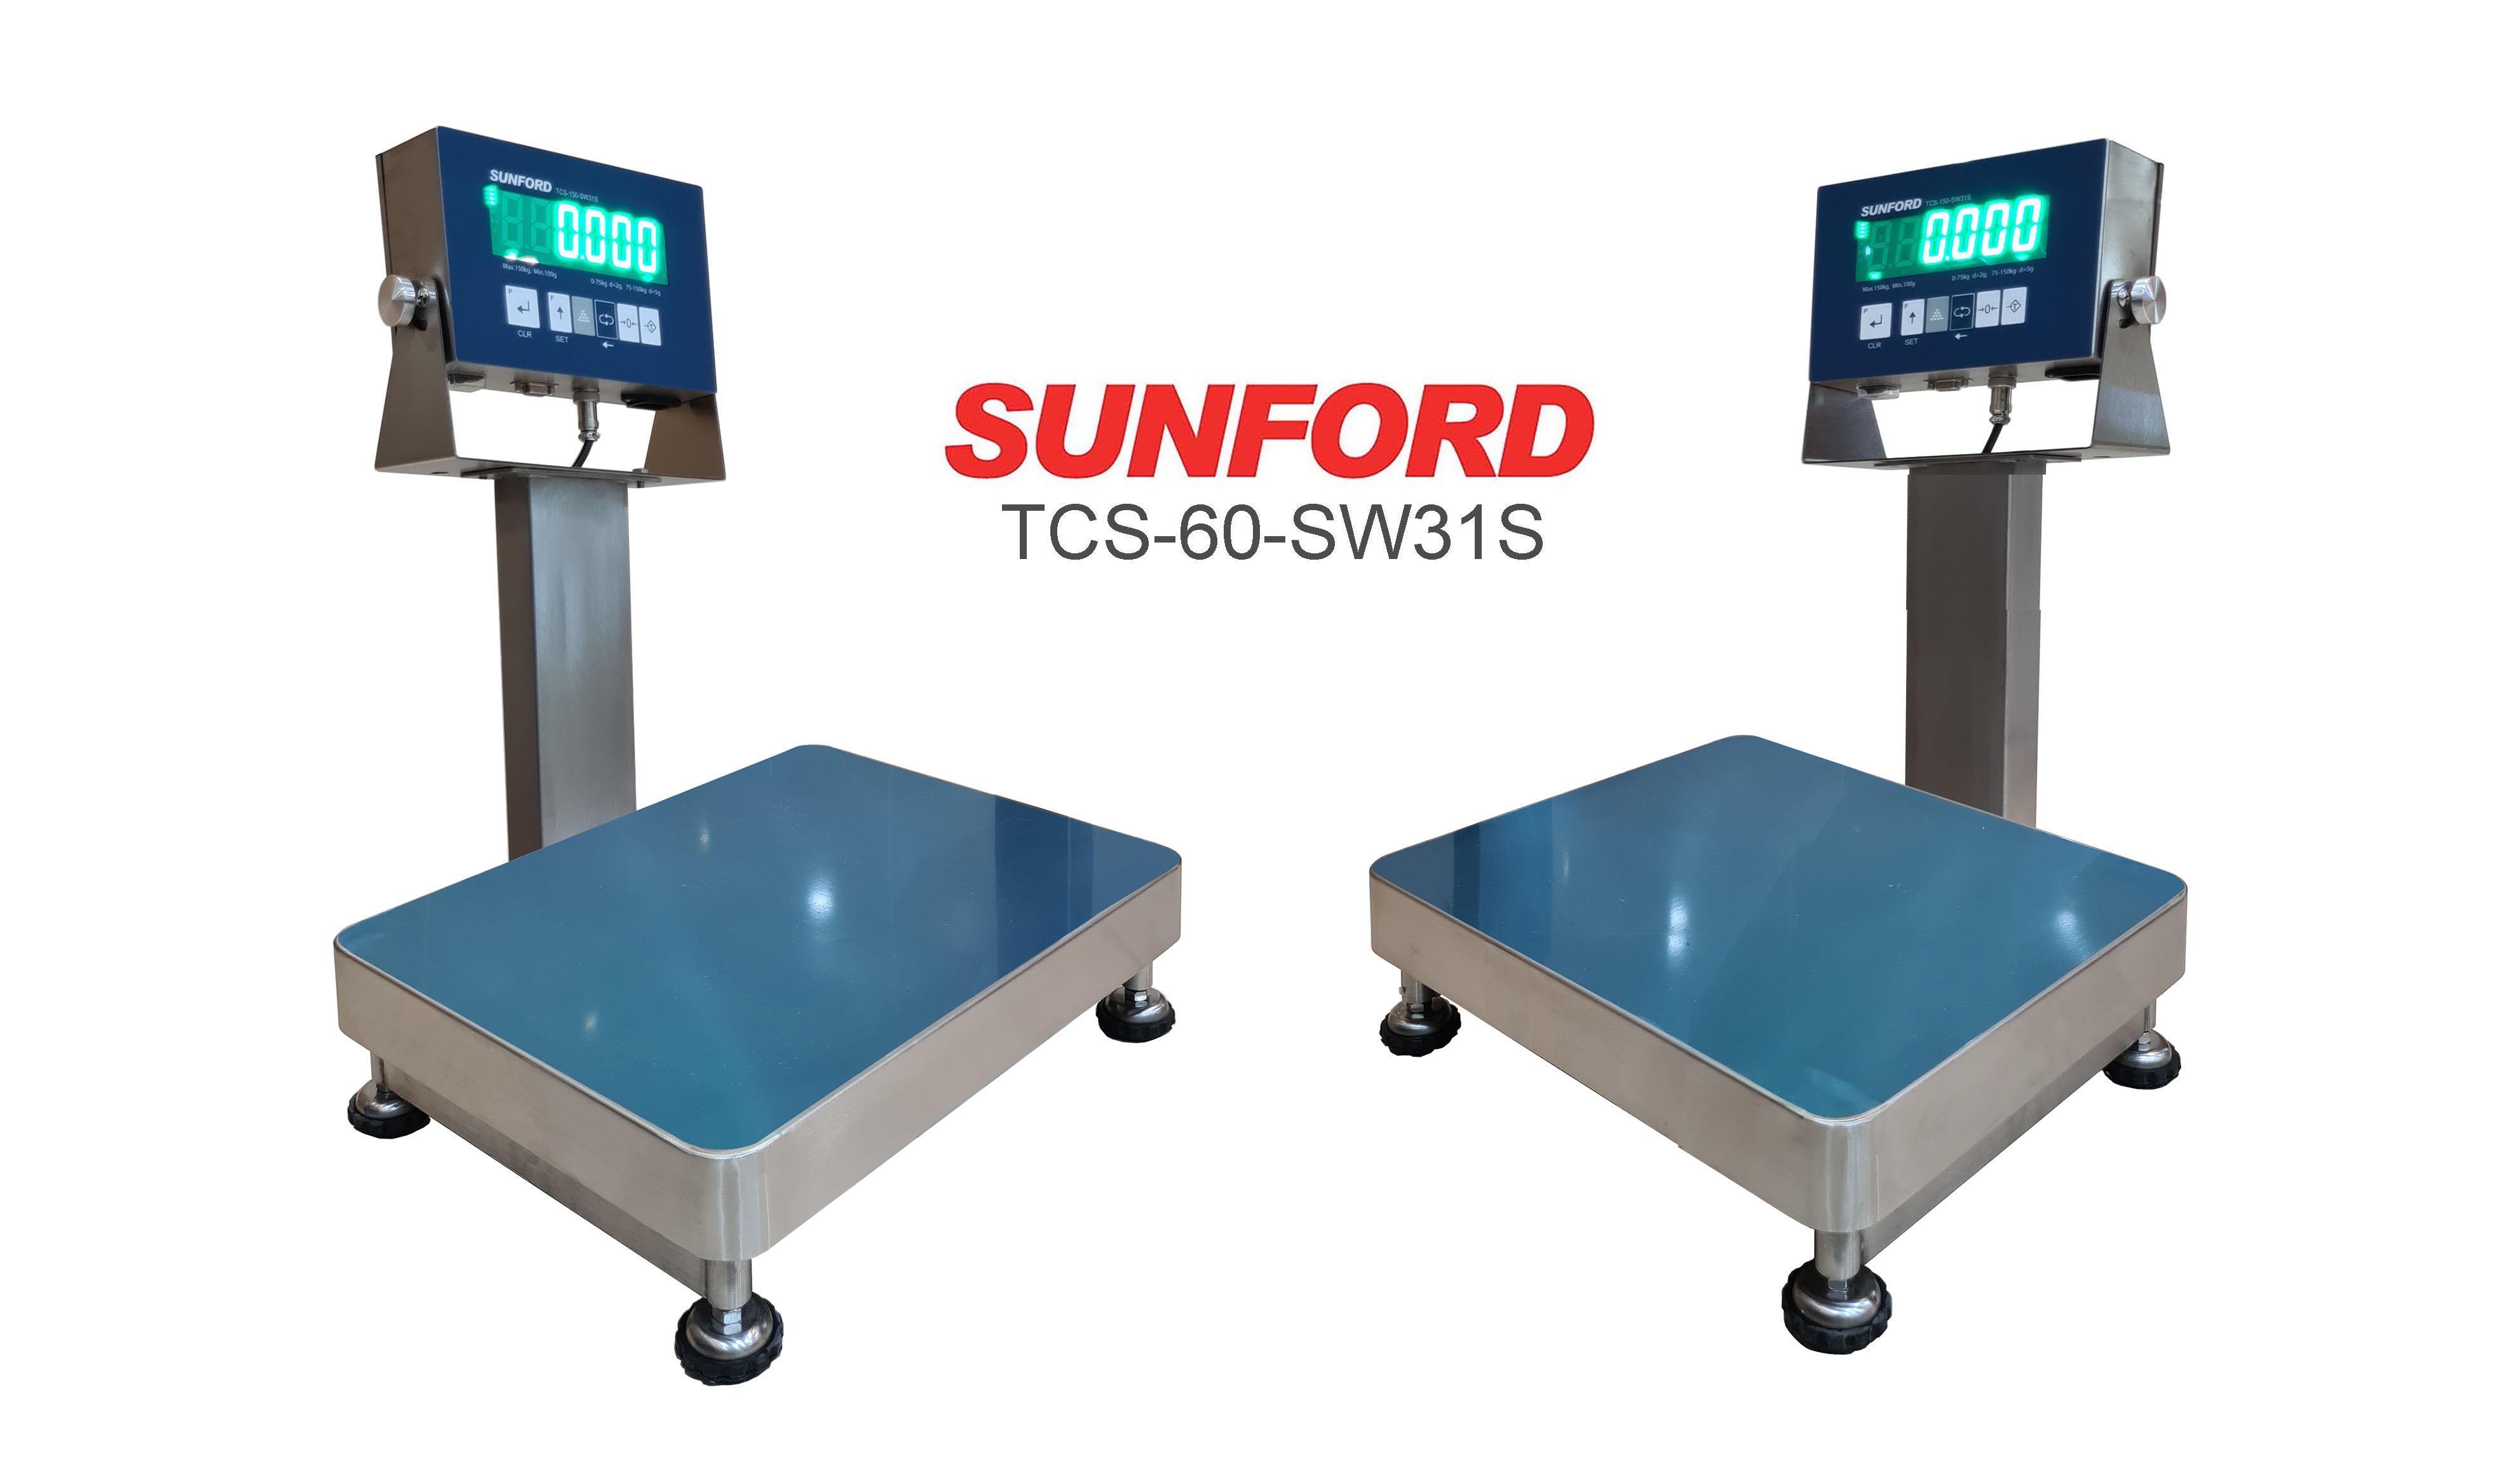 SUNFORD TCS-60-SW31S